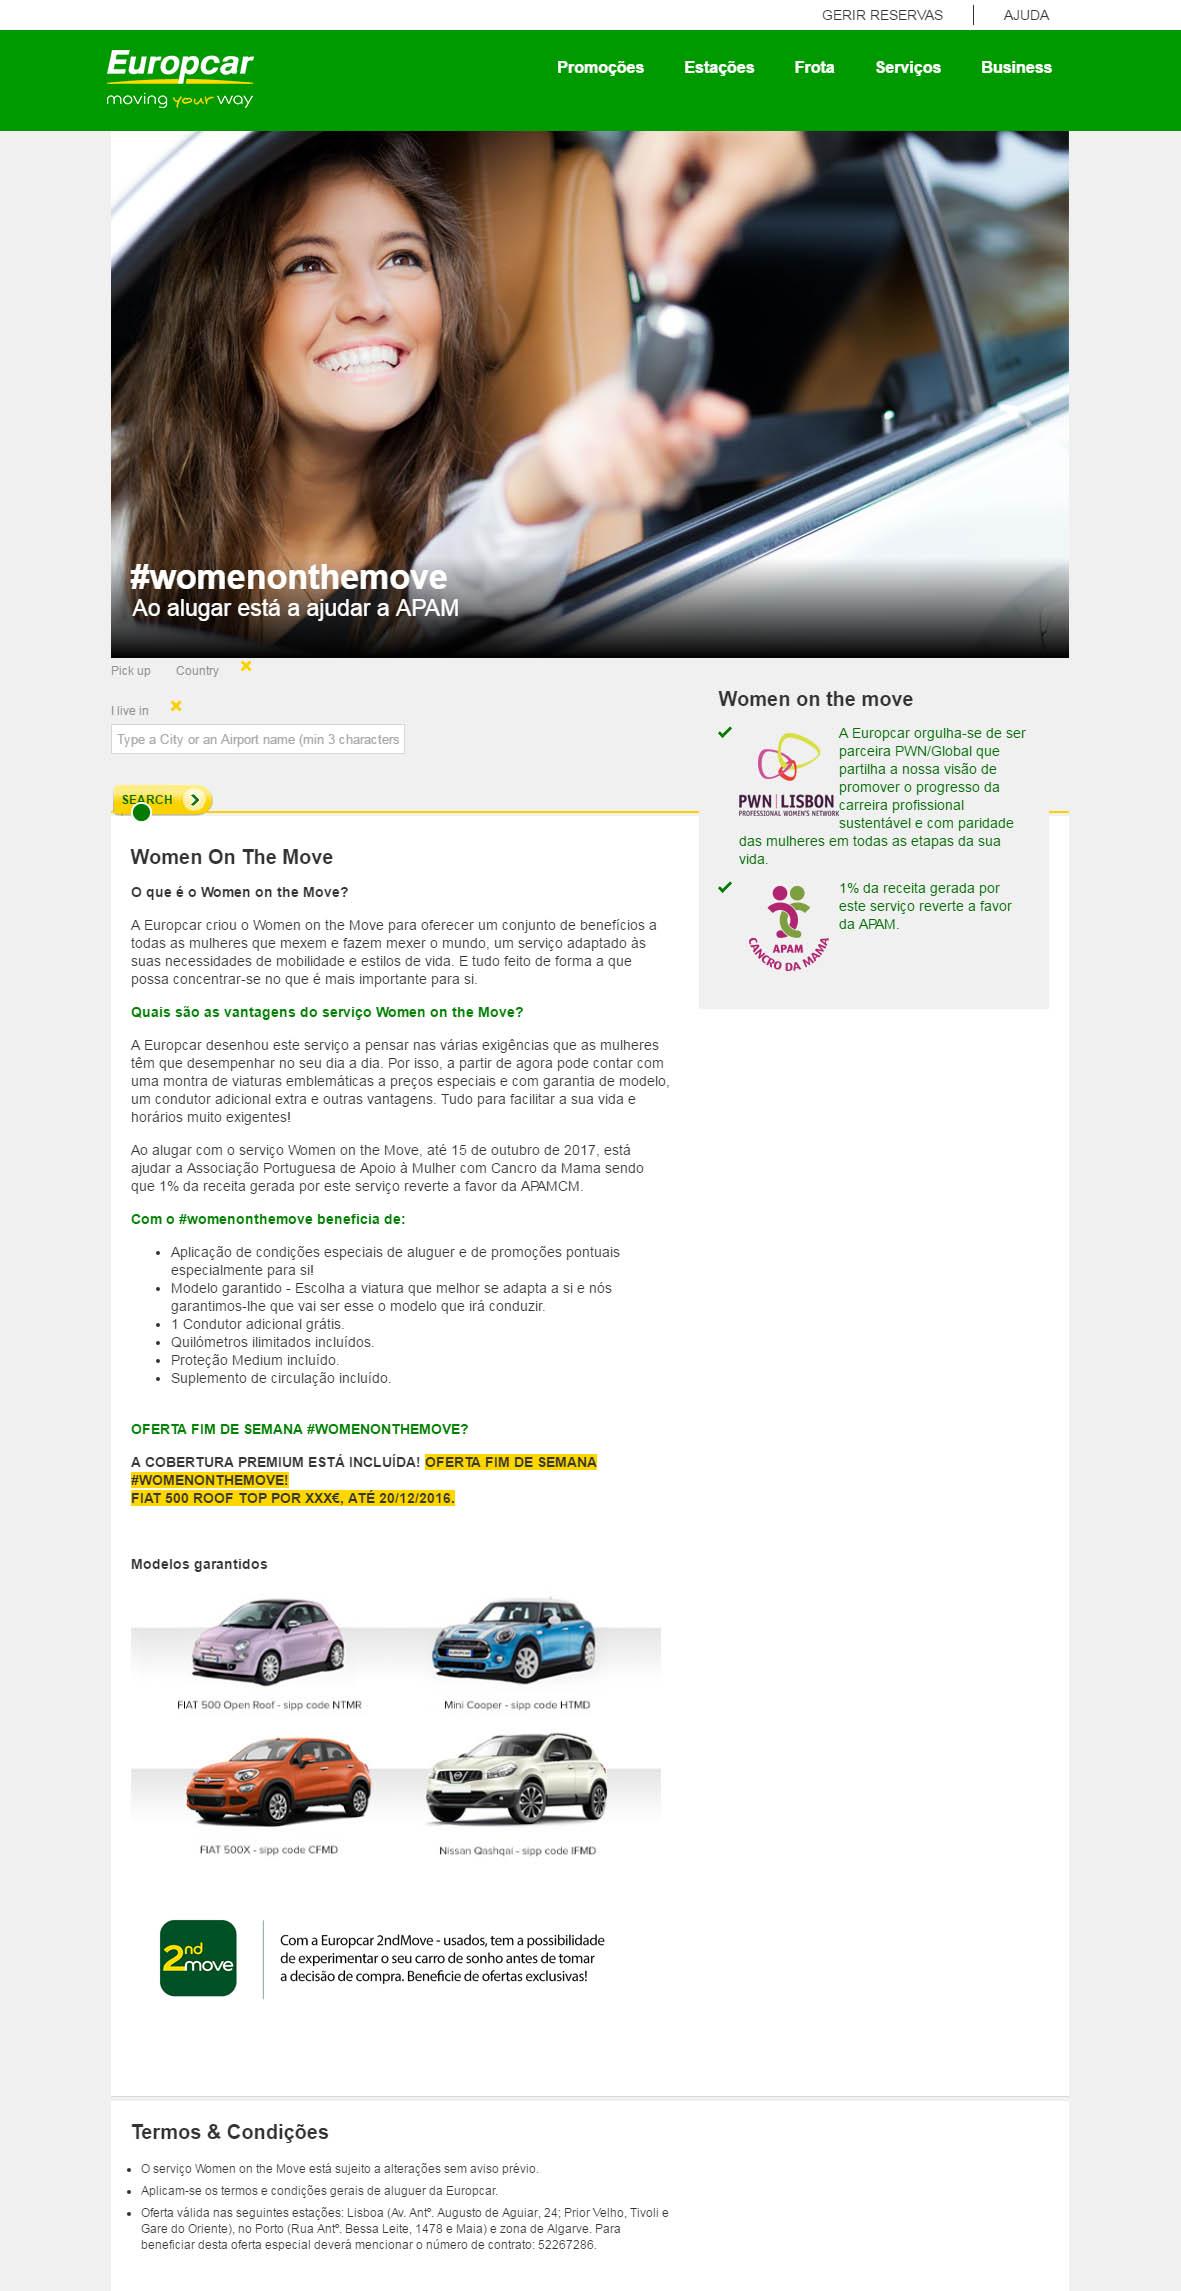 europcar-wom_02